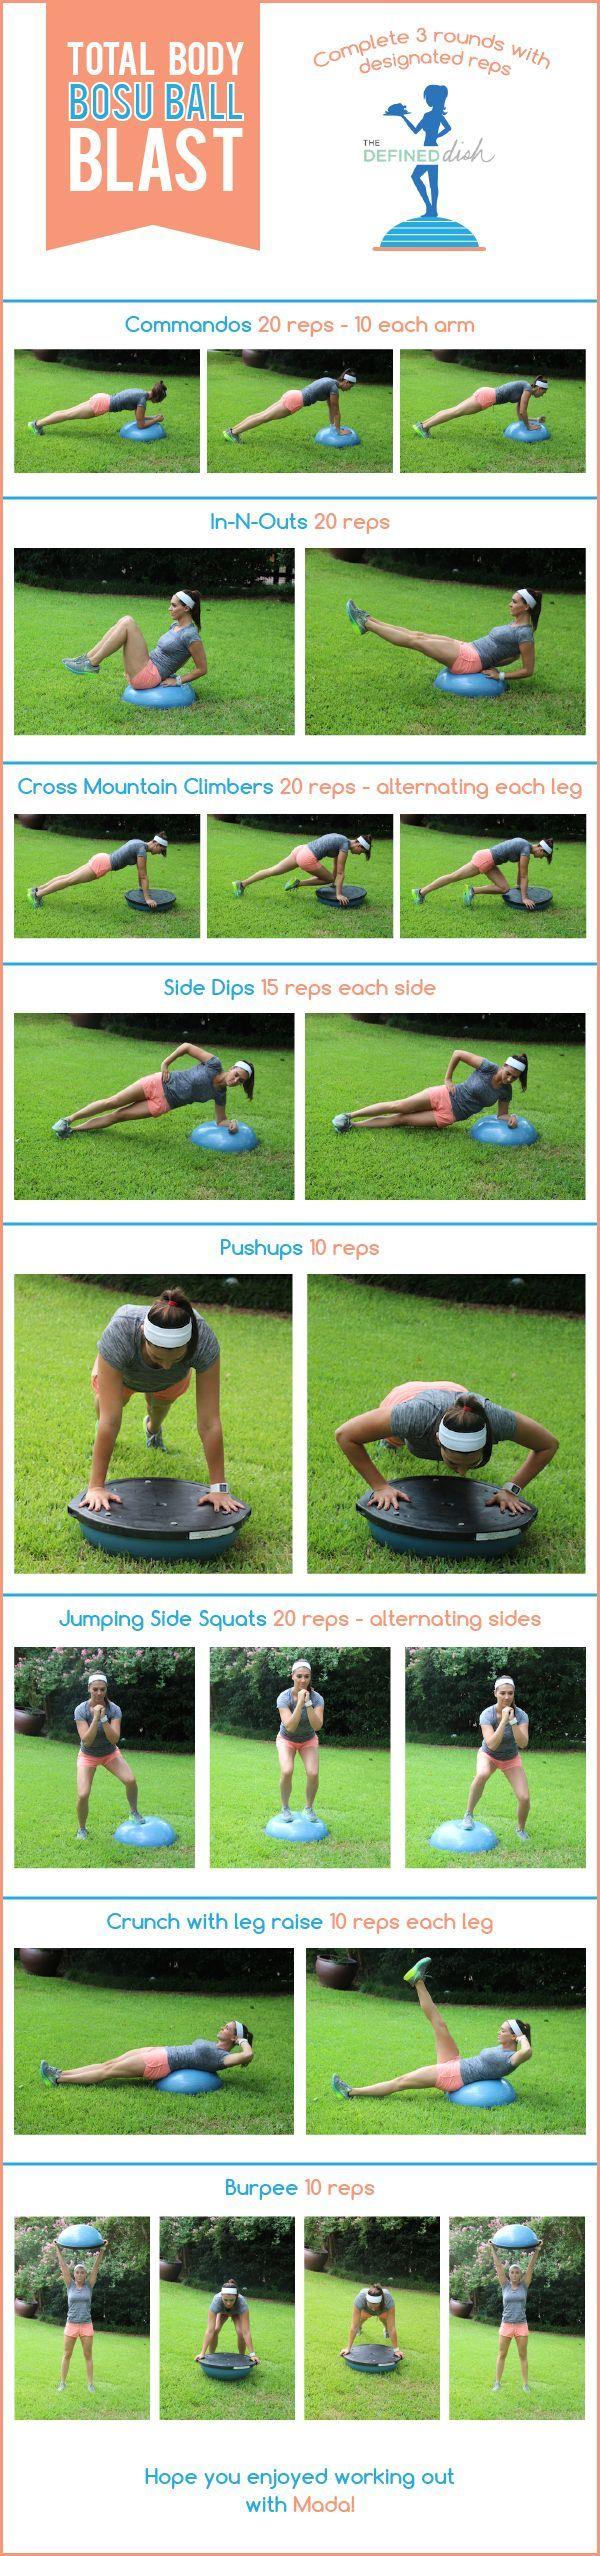 Bosu Ball Workout. #fitness #bosuball http://www.shavethepounds.com/caralluma-burn-weight-loss/